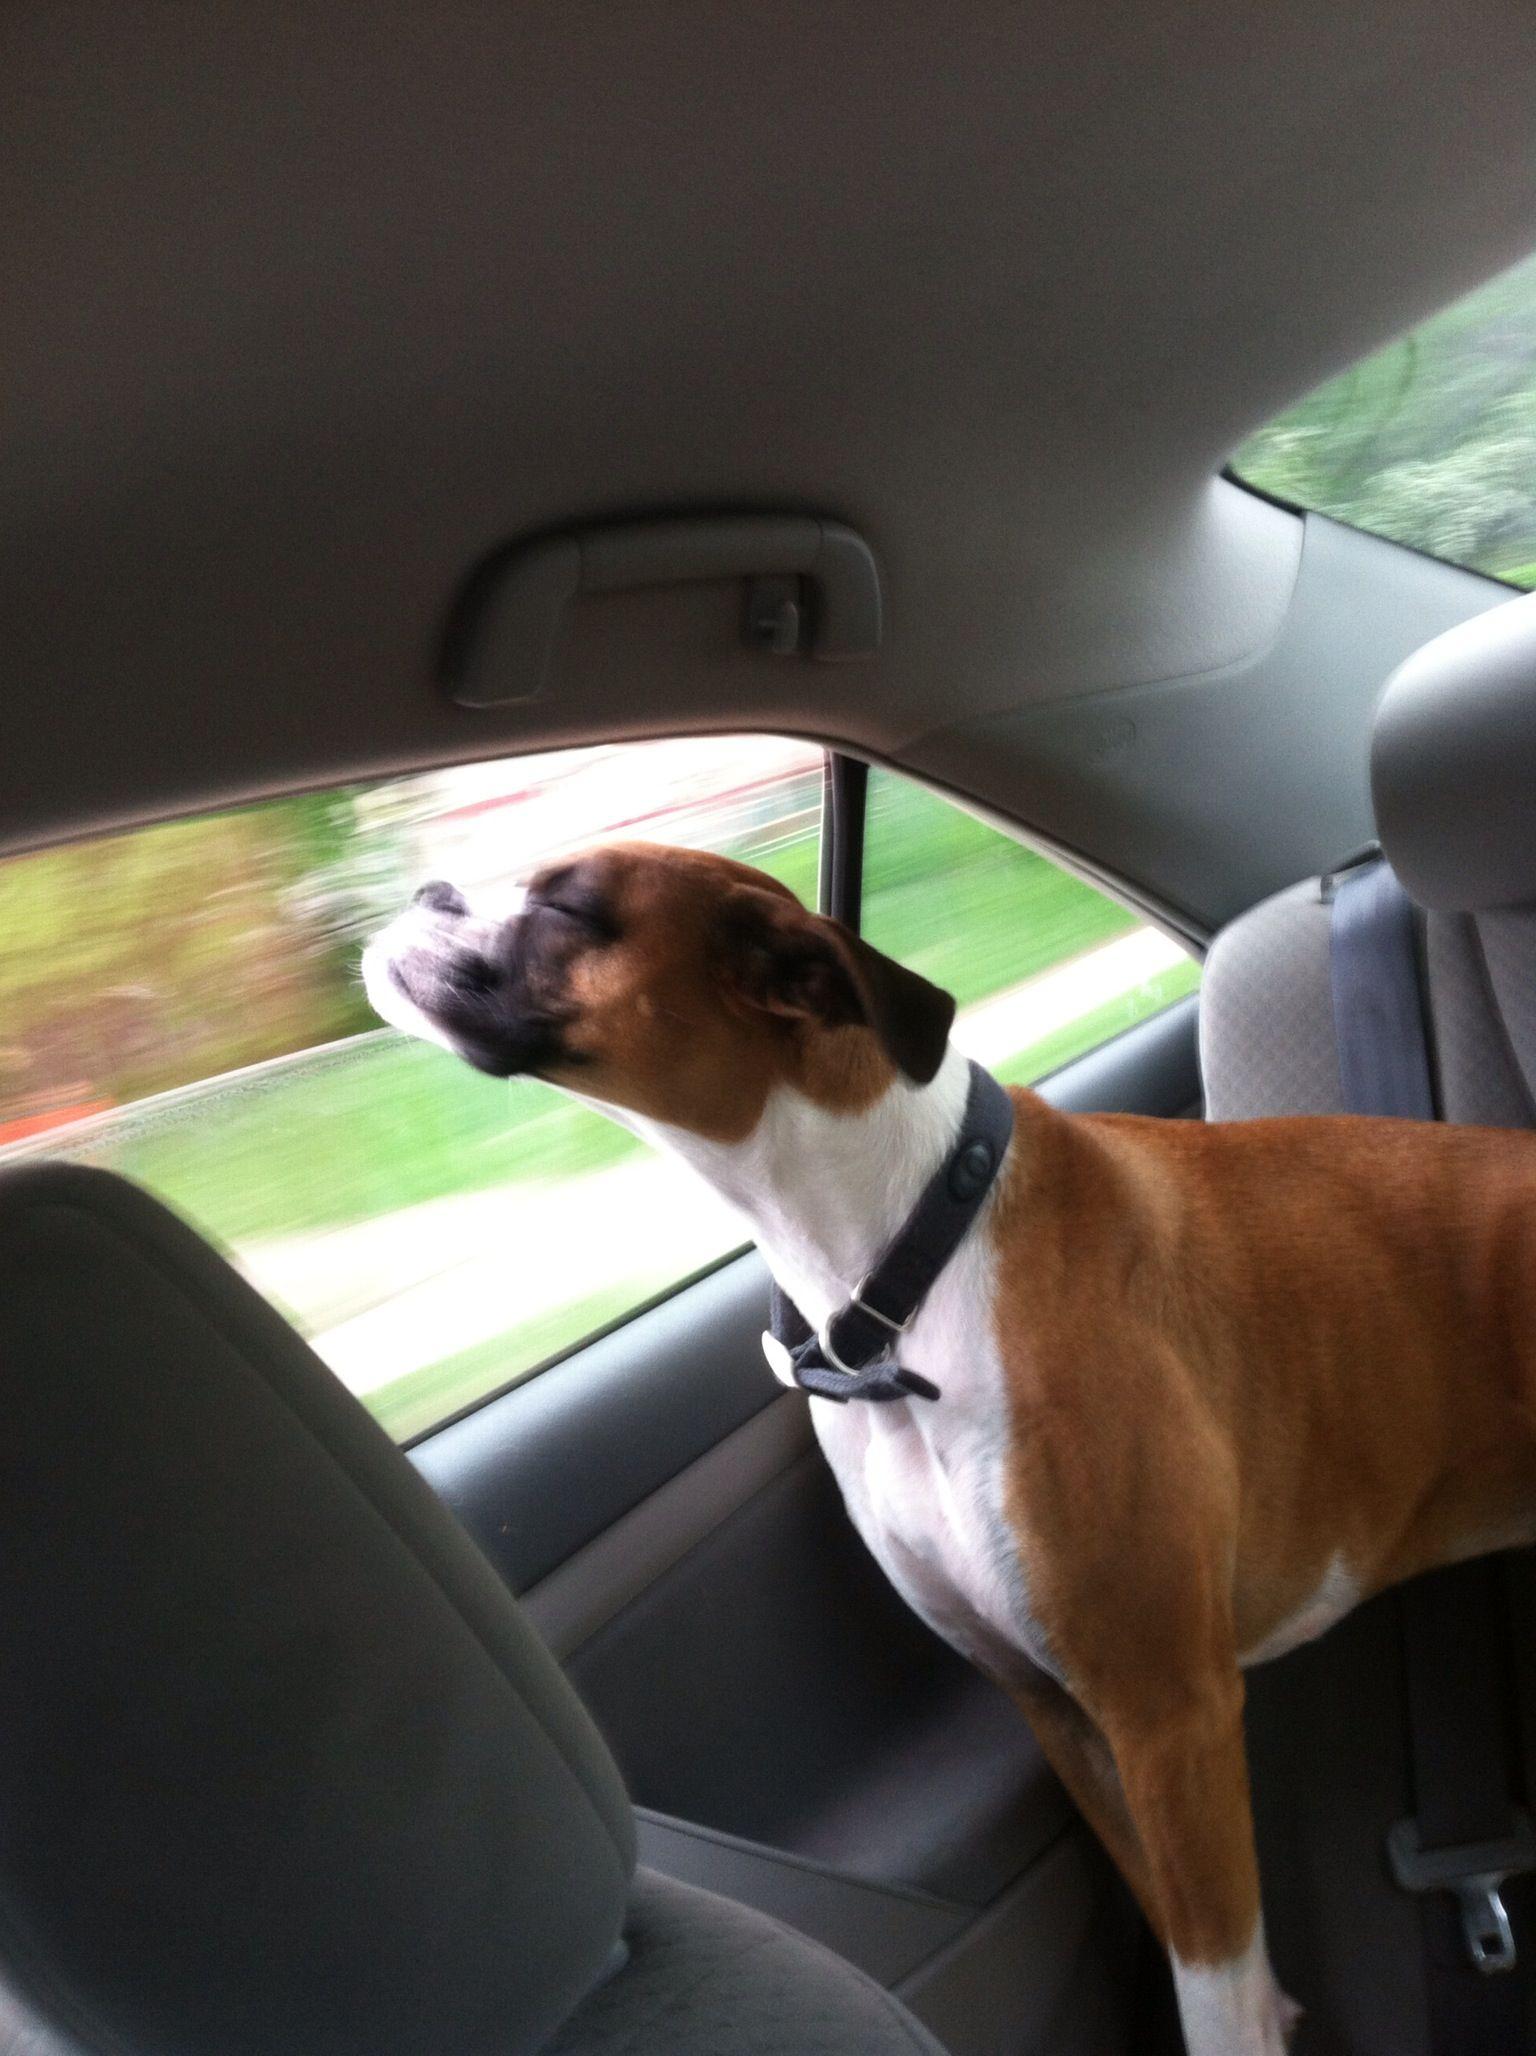 Dog Car Rides Boxer Dog Joplin Boxer Dogs I Love Dogs Dogs